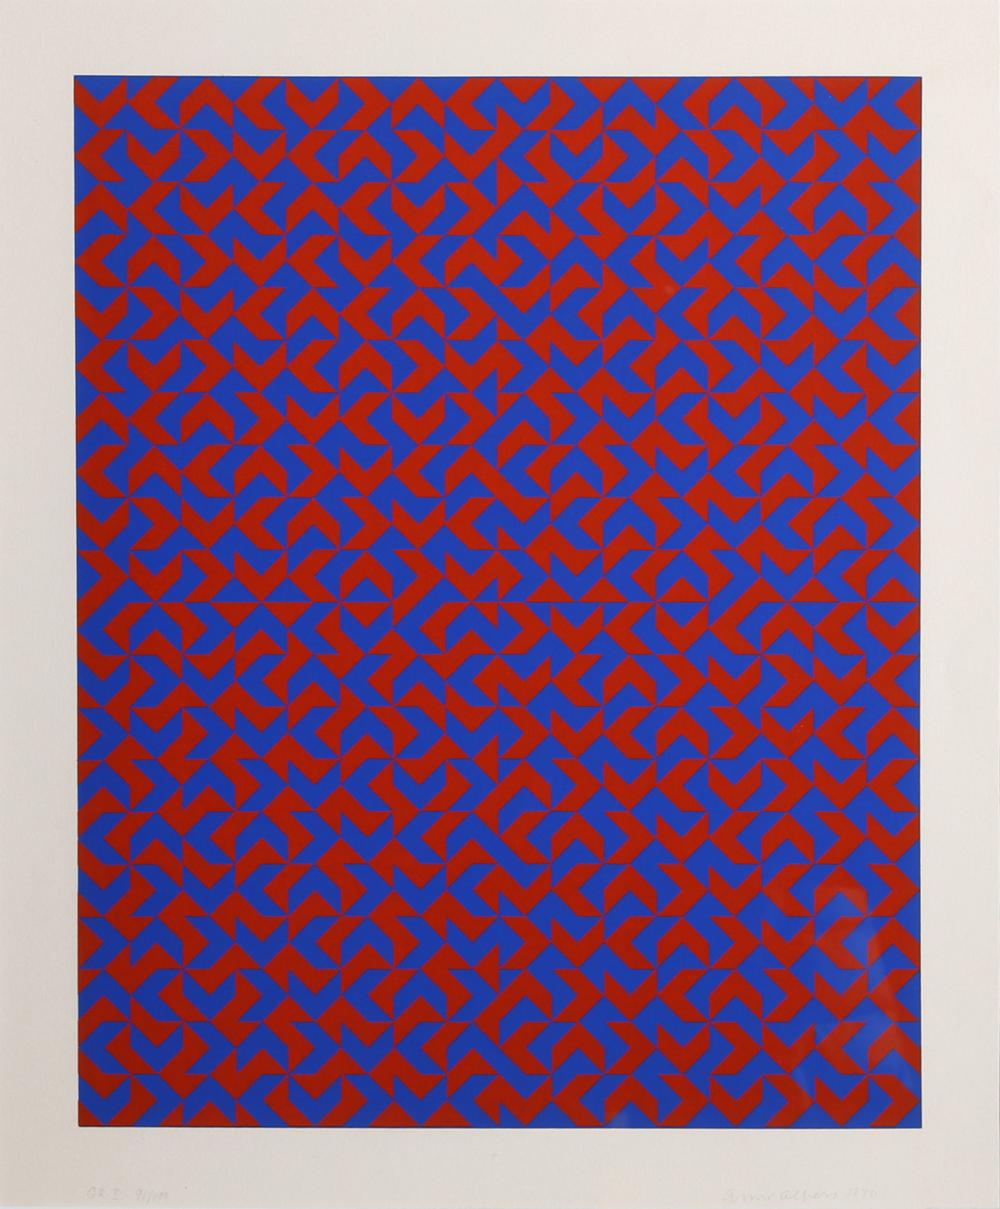 Anni Albers, GR I, Silkscreen